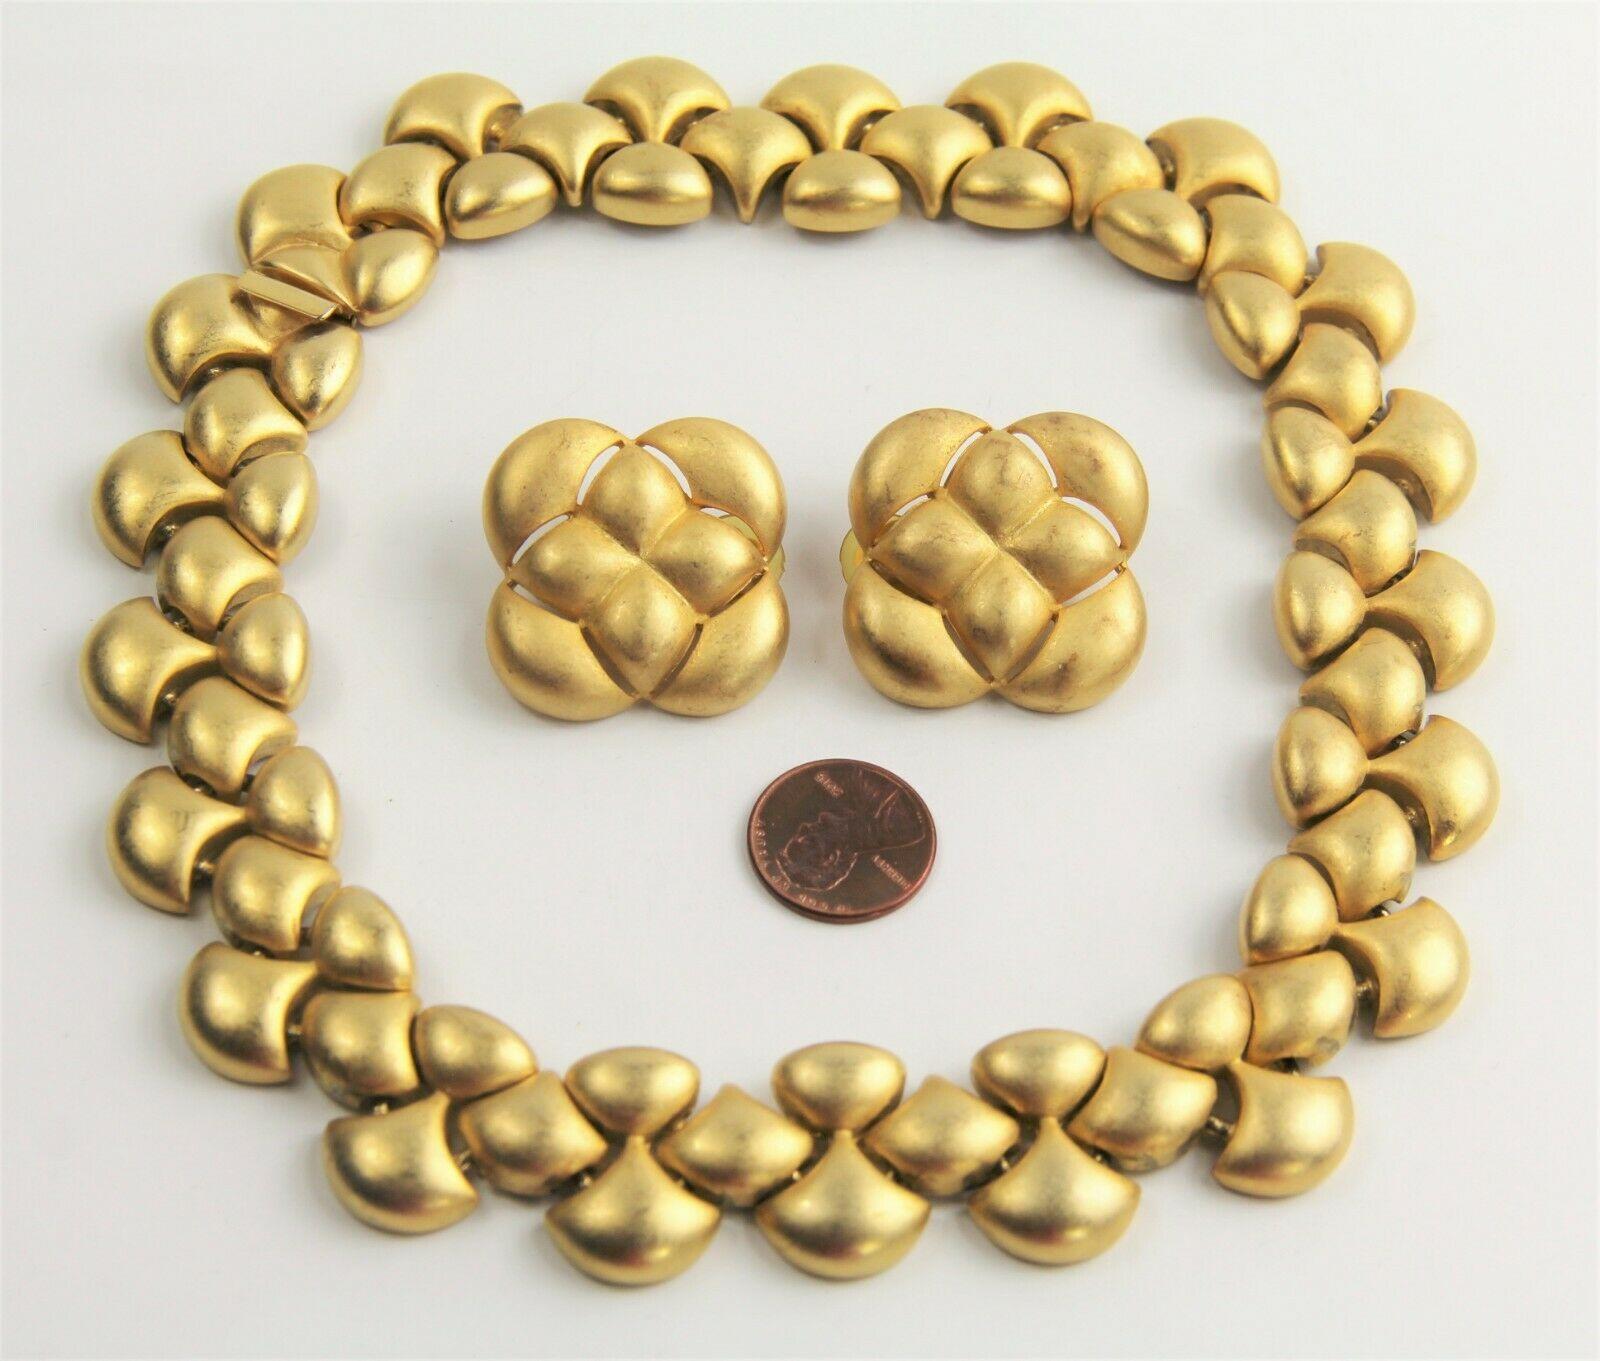 80s VINTAGE Jewelry MATTE GOLD PLATE ERWIN PEARL RUNWAY SET NECKLACE & EARRINGS